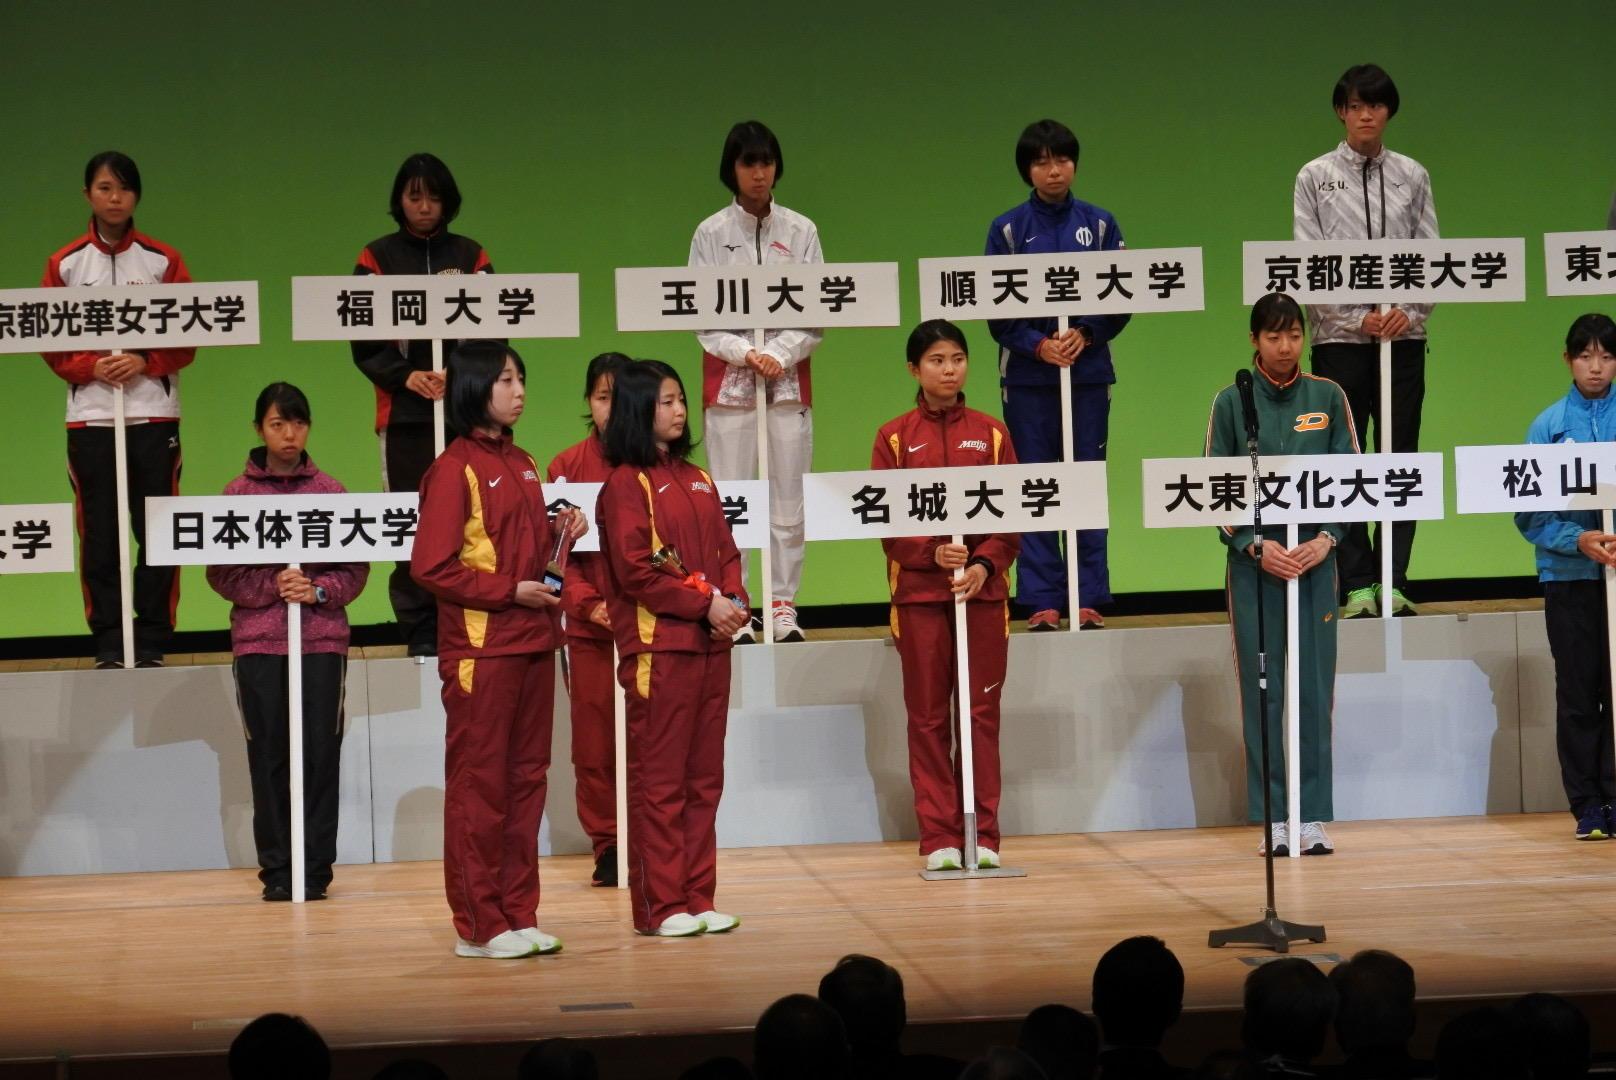 富士市長杯と富士宮市長杯を返還した向井智香選手(法学部法学科4年、手前右)と志和真純選手(同、手前左)